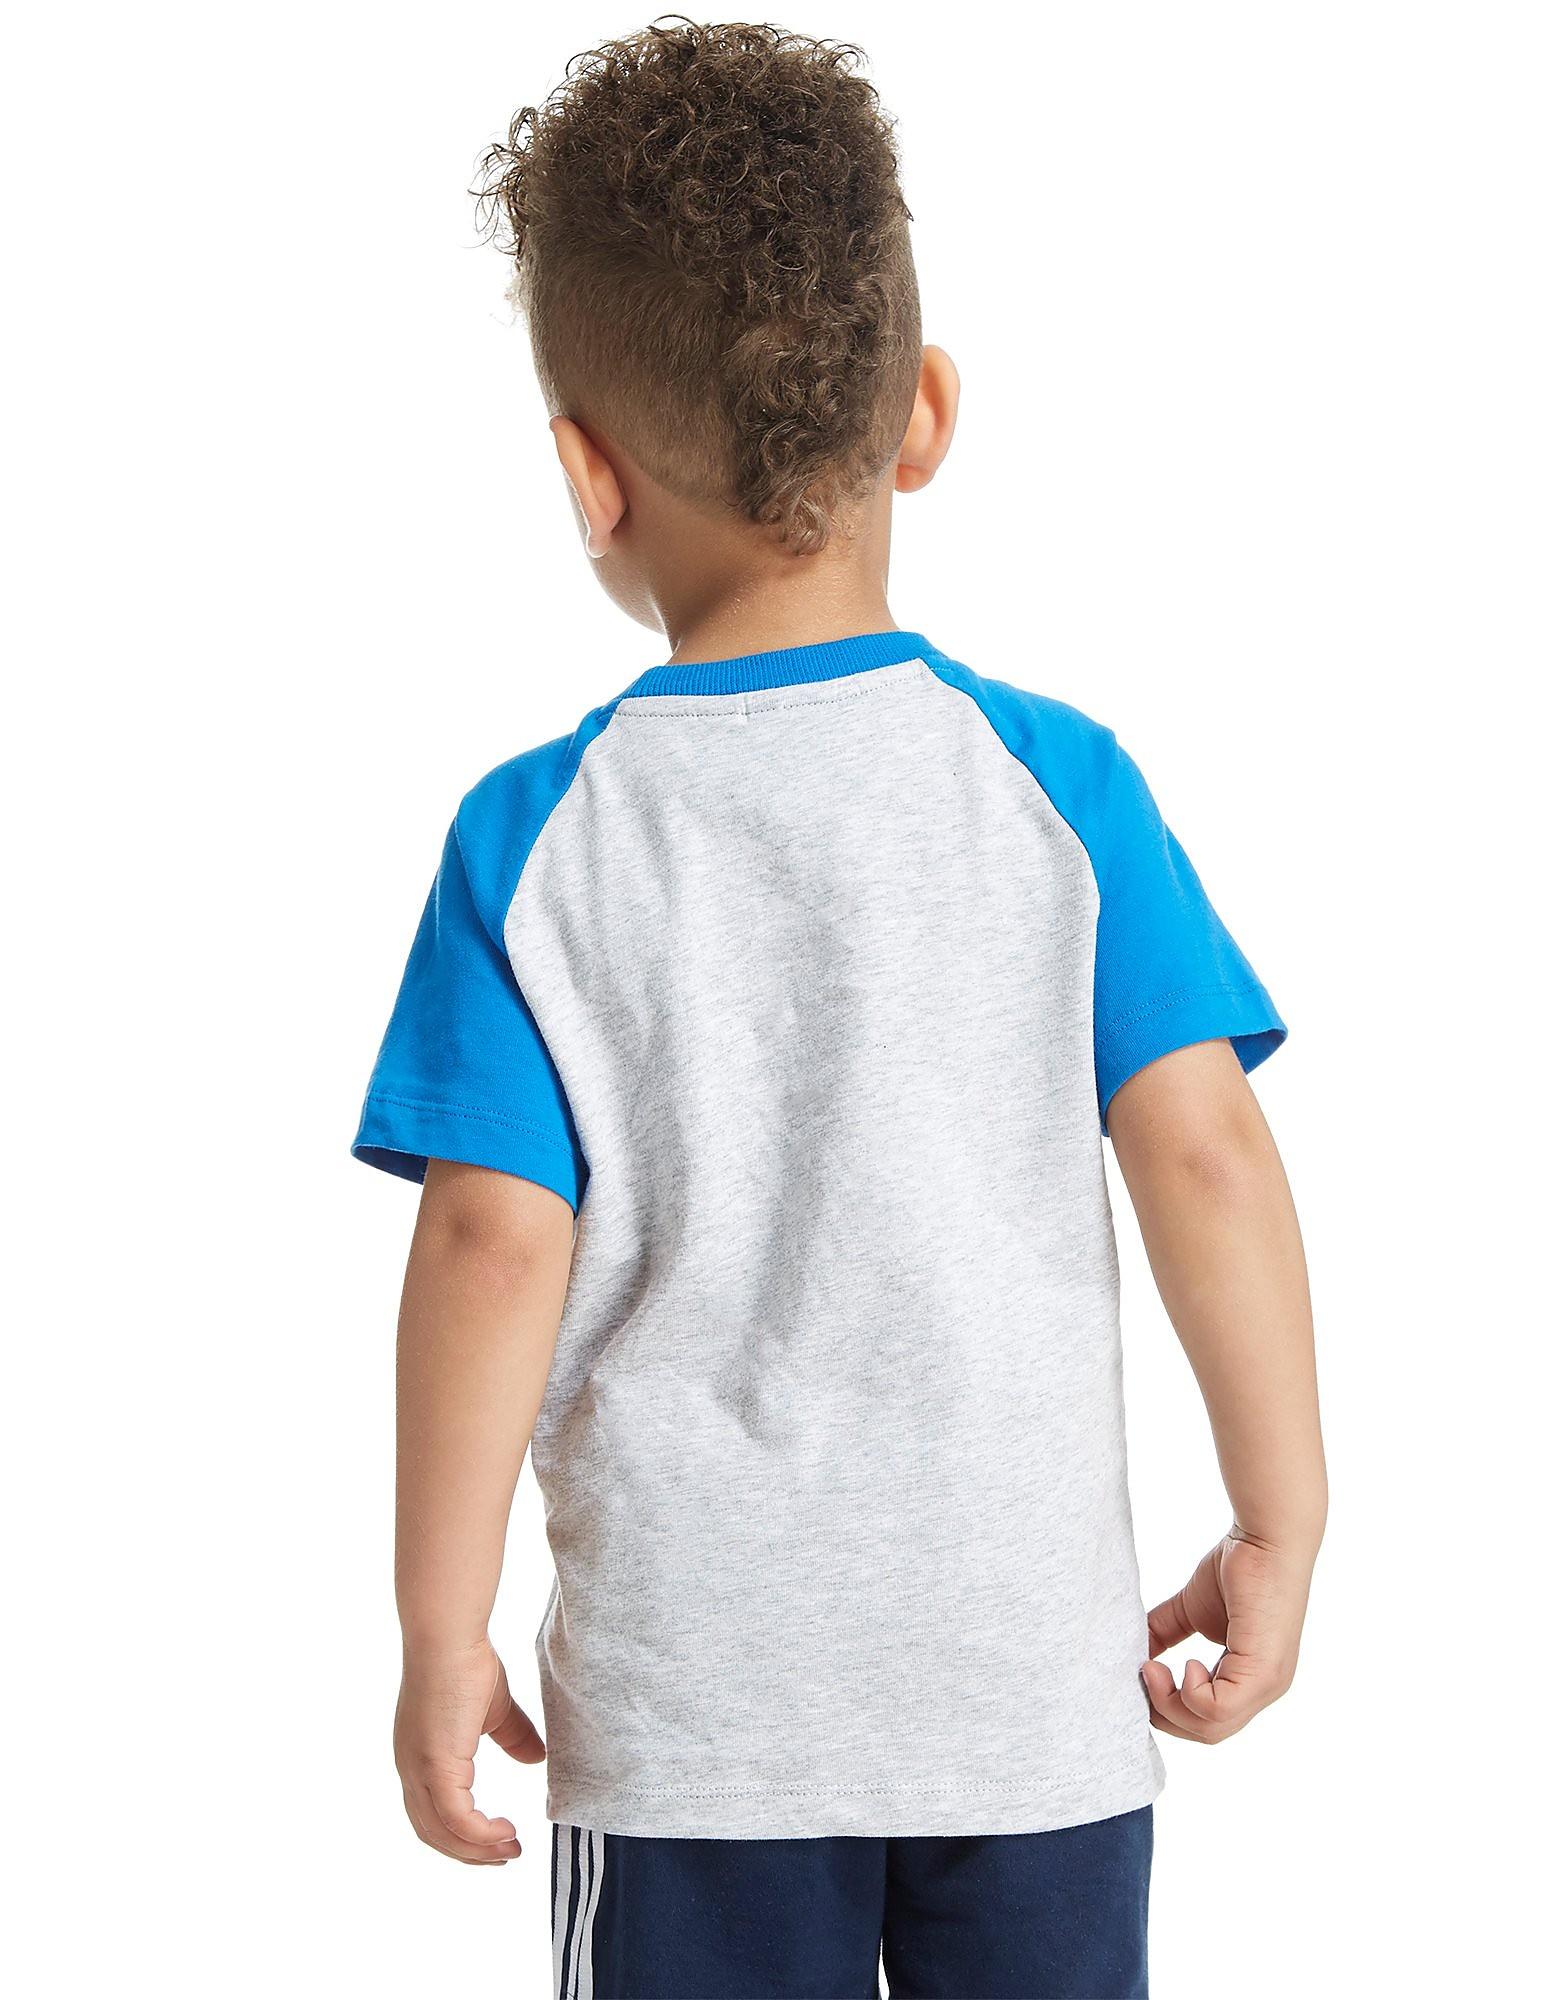 adidas Originals Superstar Trefoil T-Shirt Infant